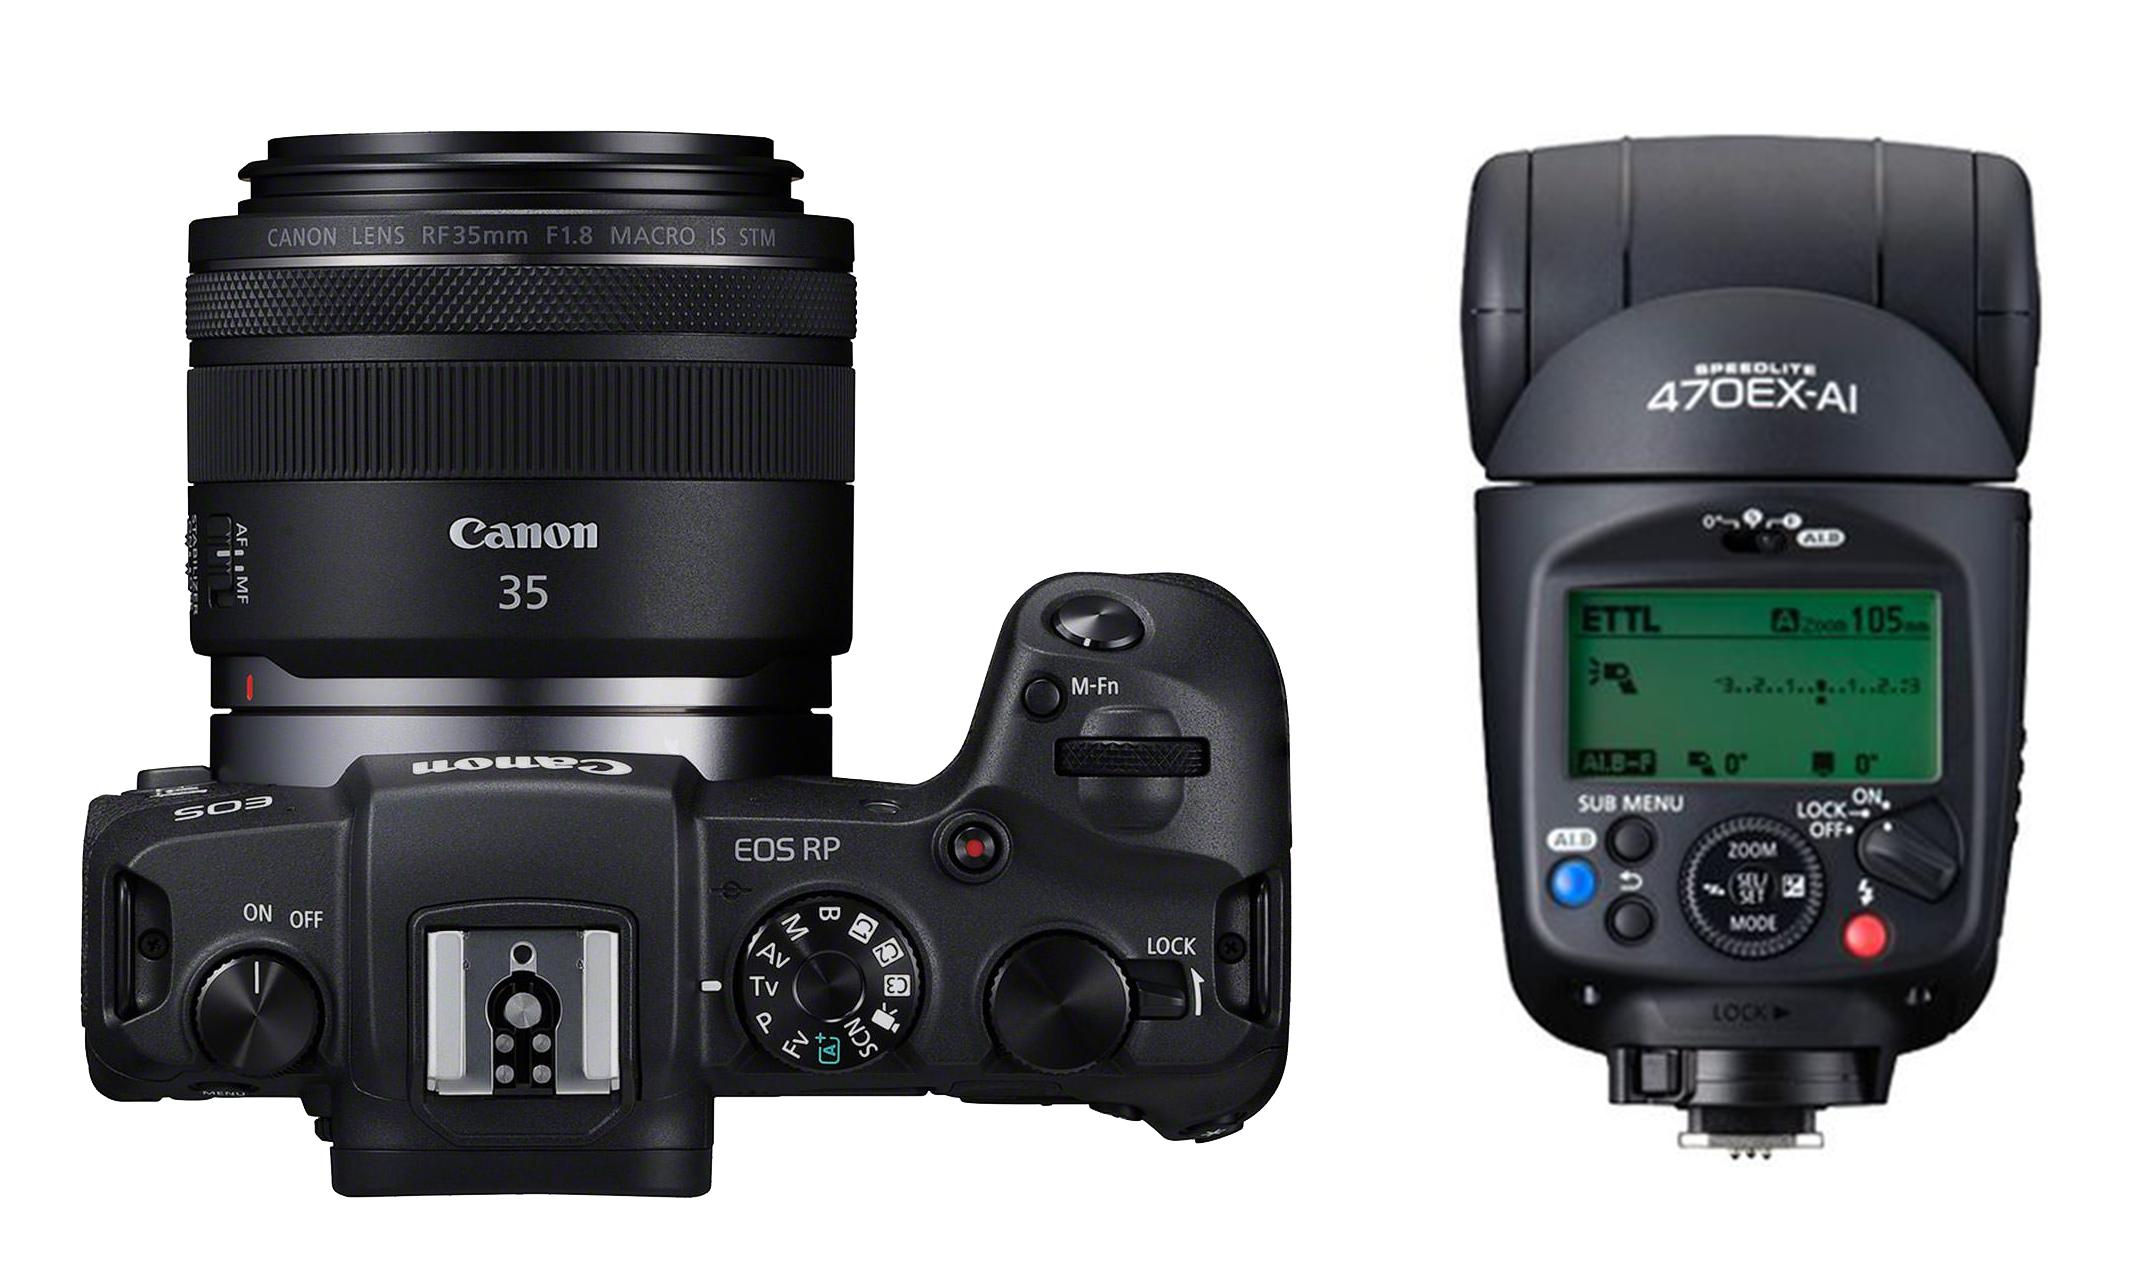 [Lokal Münster] Canon EOS RP mit EF Adapter + RF 35mm f1.8 Makro + Speedlite 470EX-AI + Extras